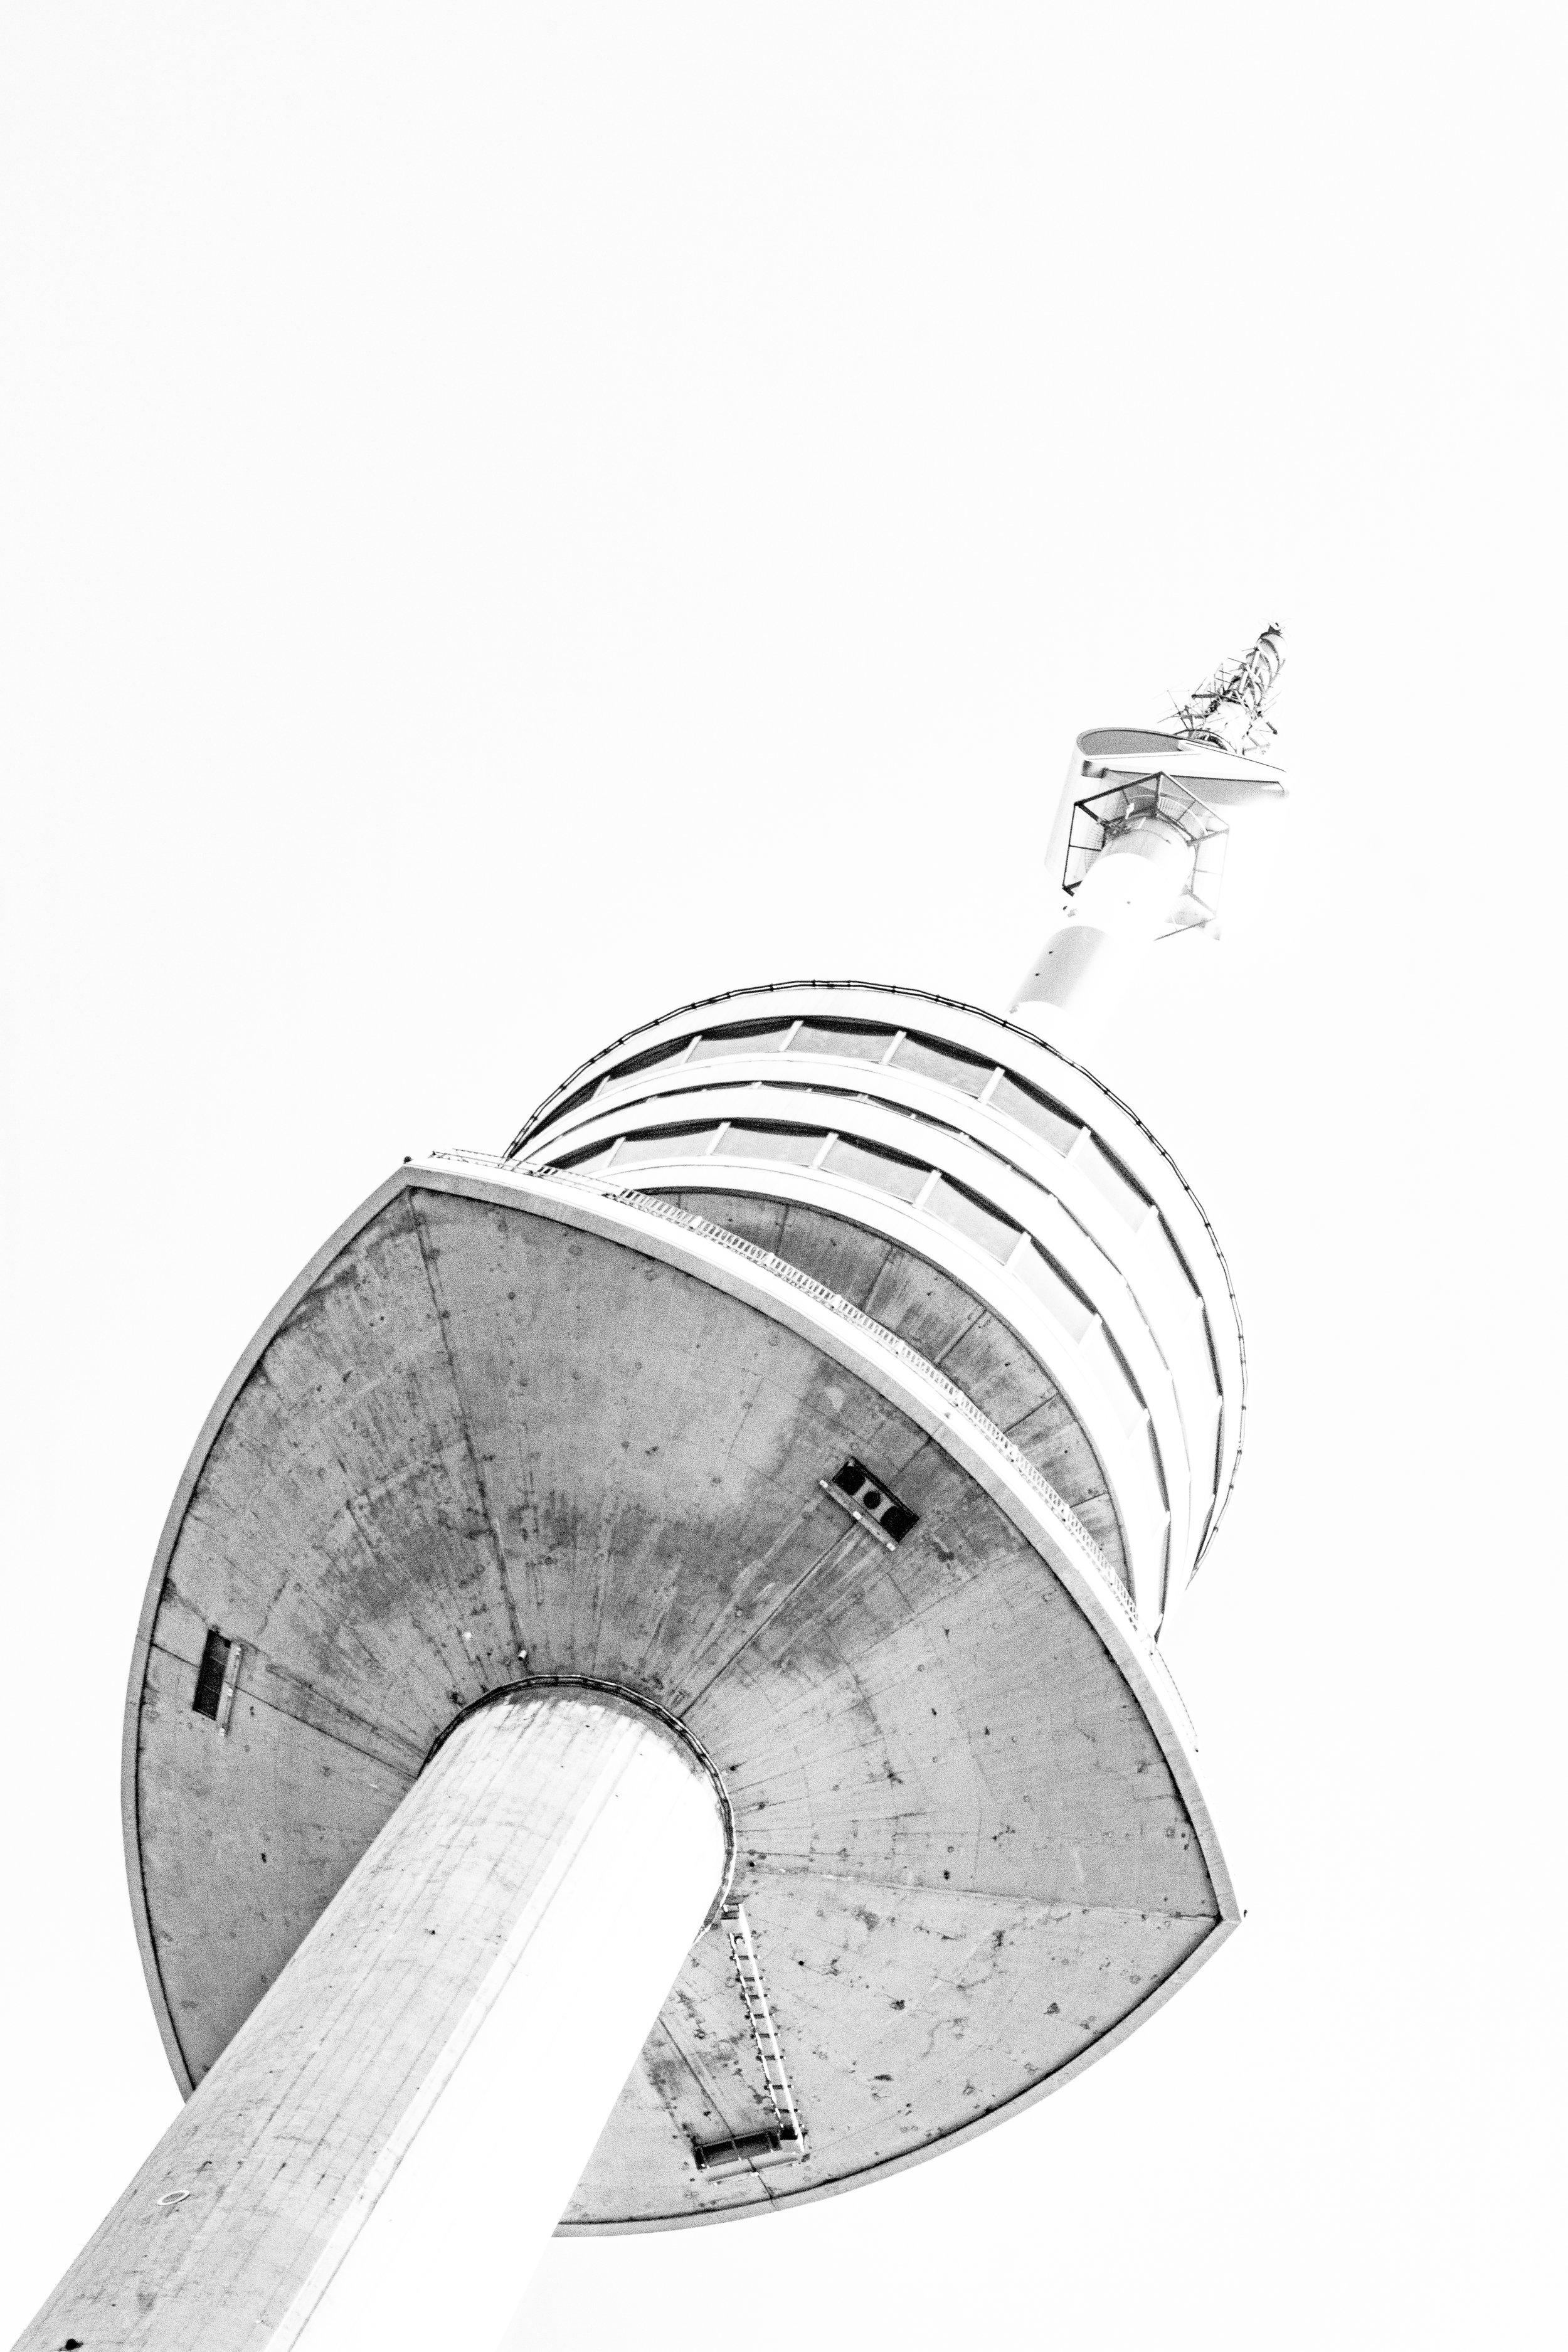 1220 Wien - Donauturm